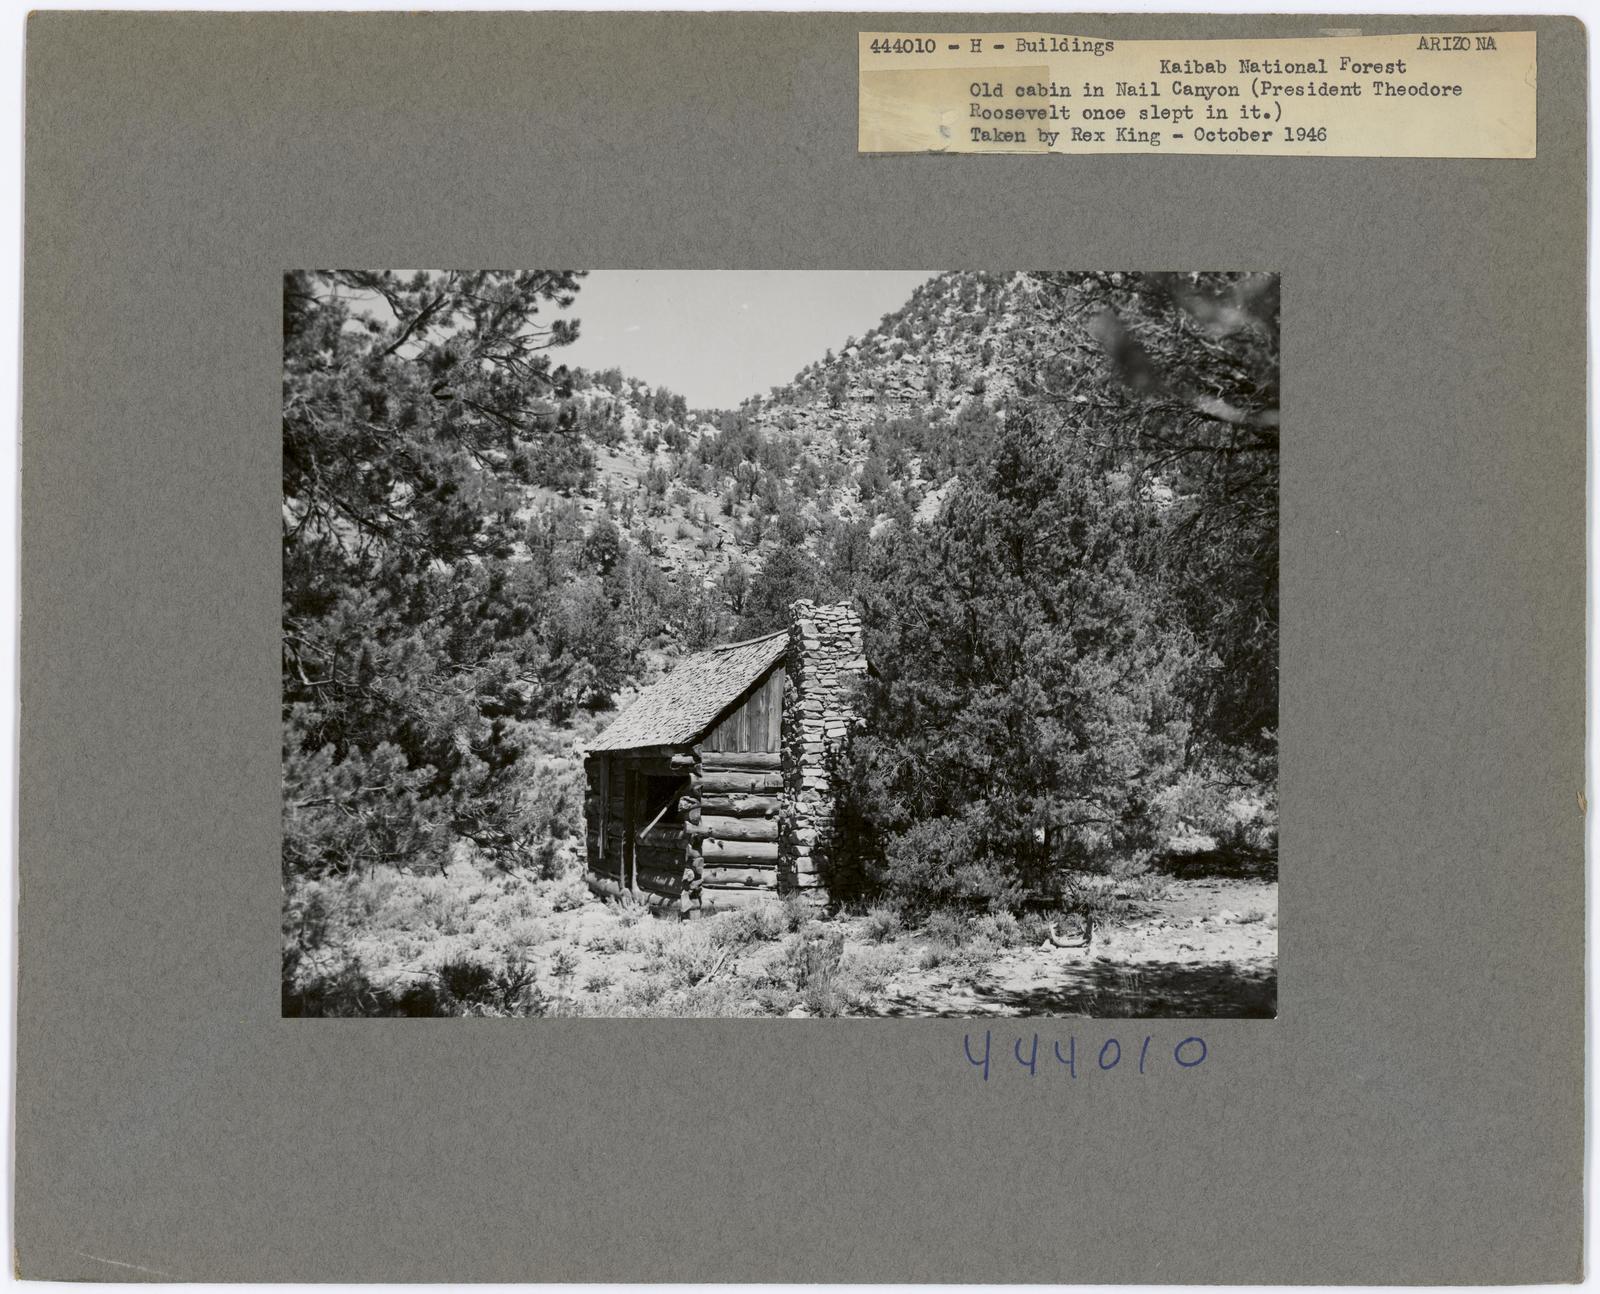 Historical Buildings - Arizona